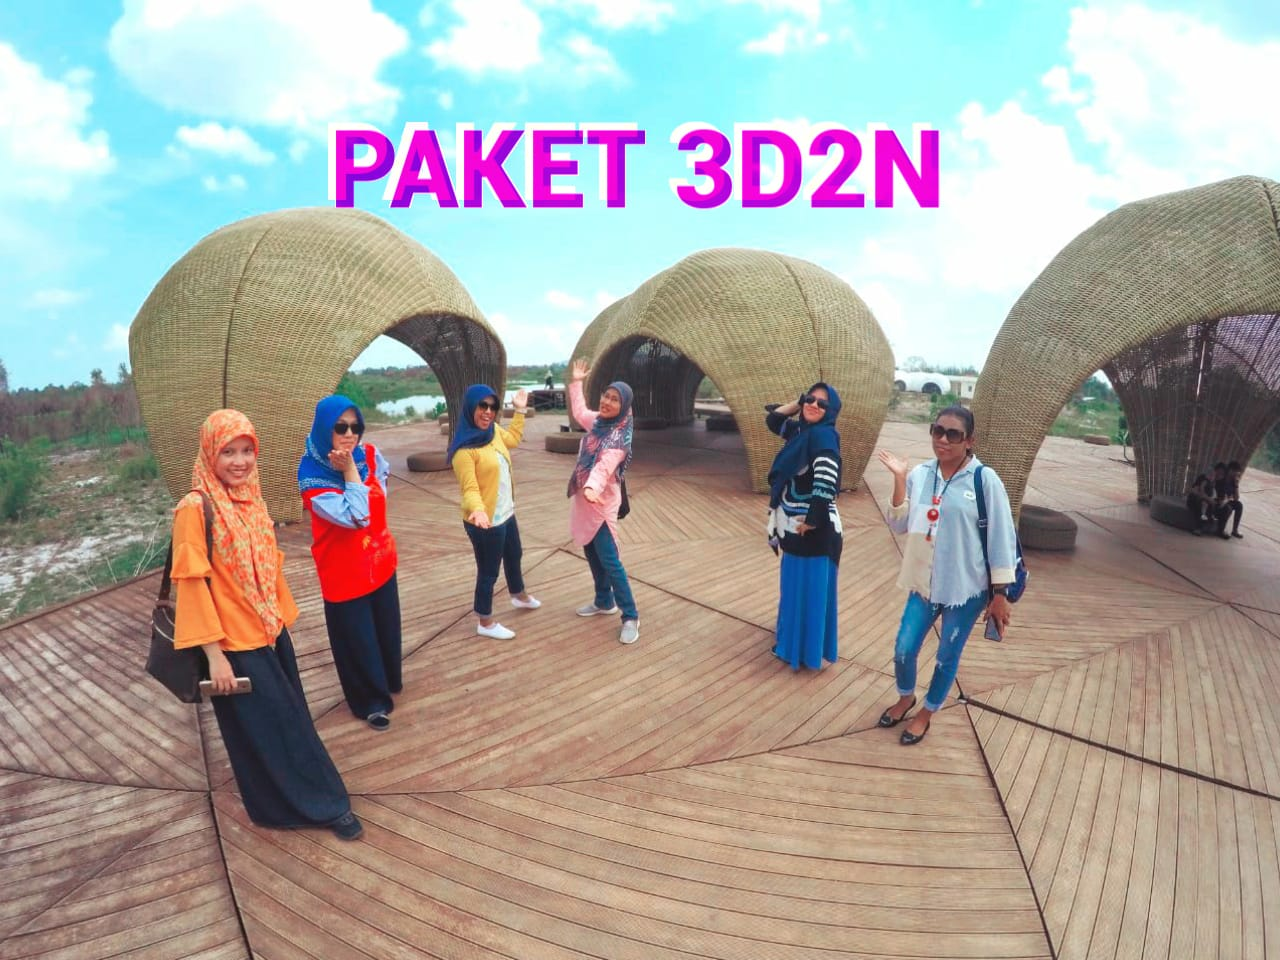 Paket 3D2N